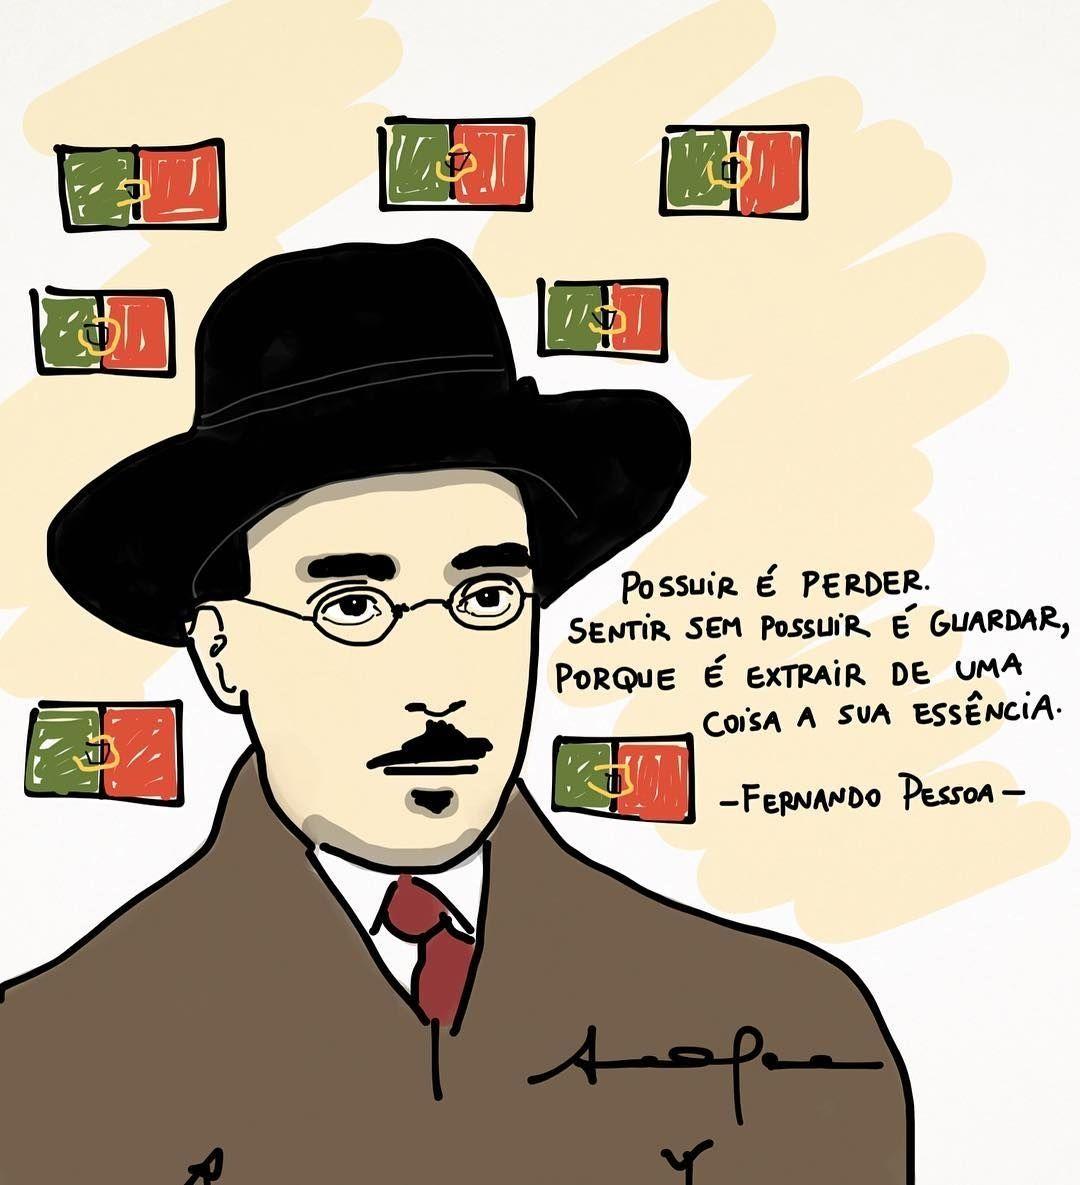 regram @anaclaratissot Madrugada com Pessoa que pessoa recusaria? #rabisco #anaclaratissot #literatura #ilustra #fernandopessoa